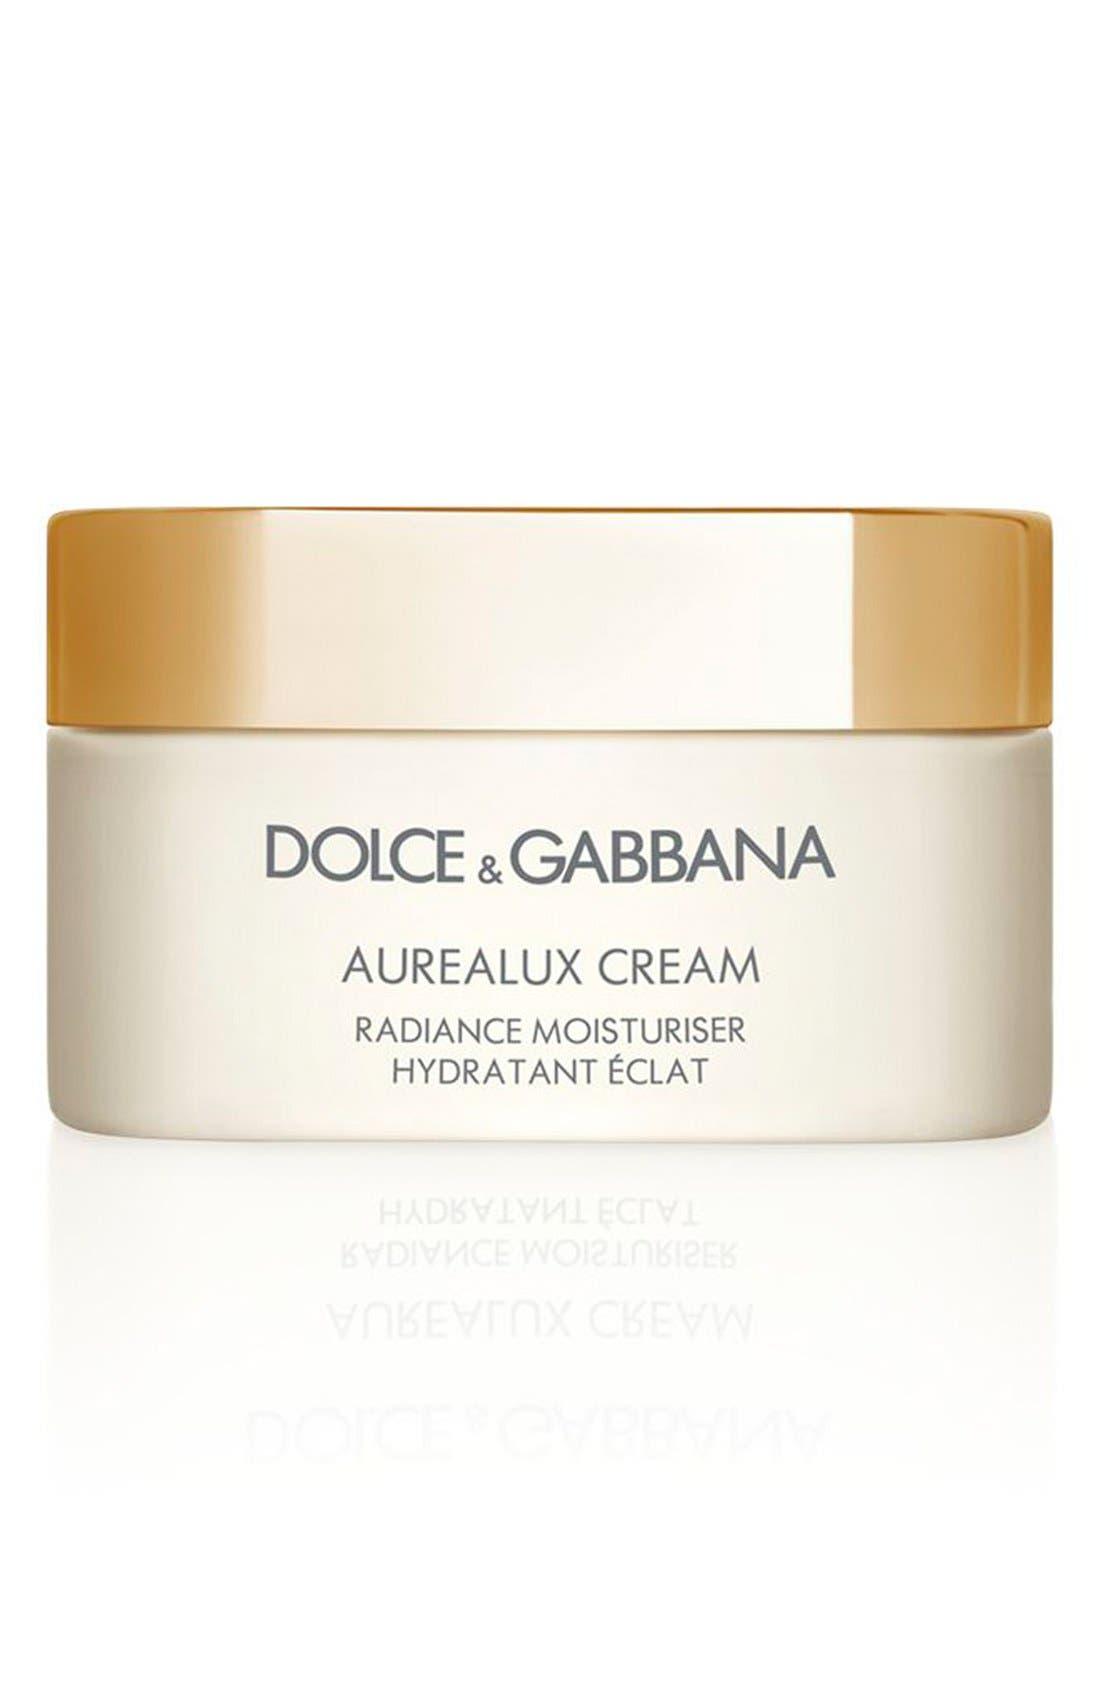 Dolce&GabbanaBeauty 'Aurealux' Cream Radiance Moisturizer,                             Main thumbnail 1, color,